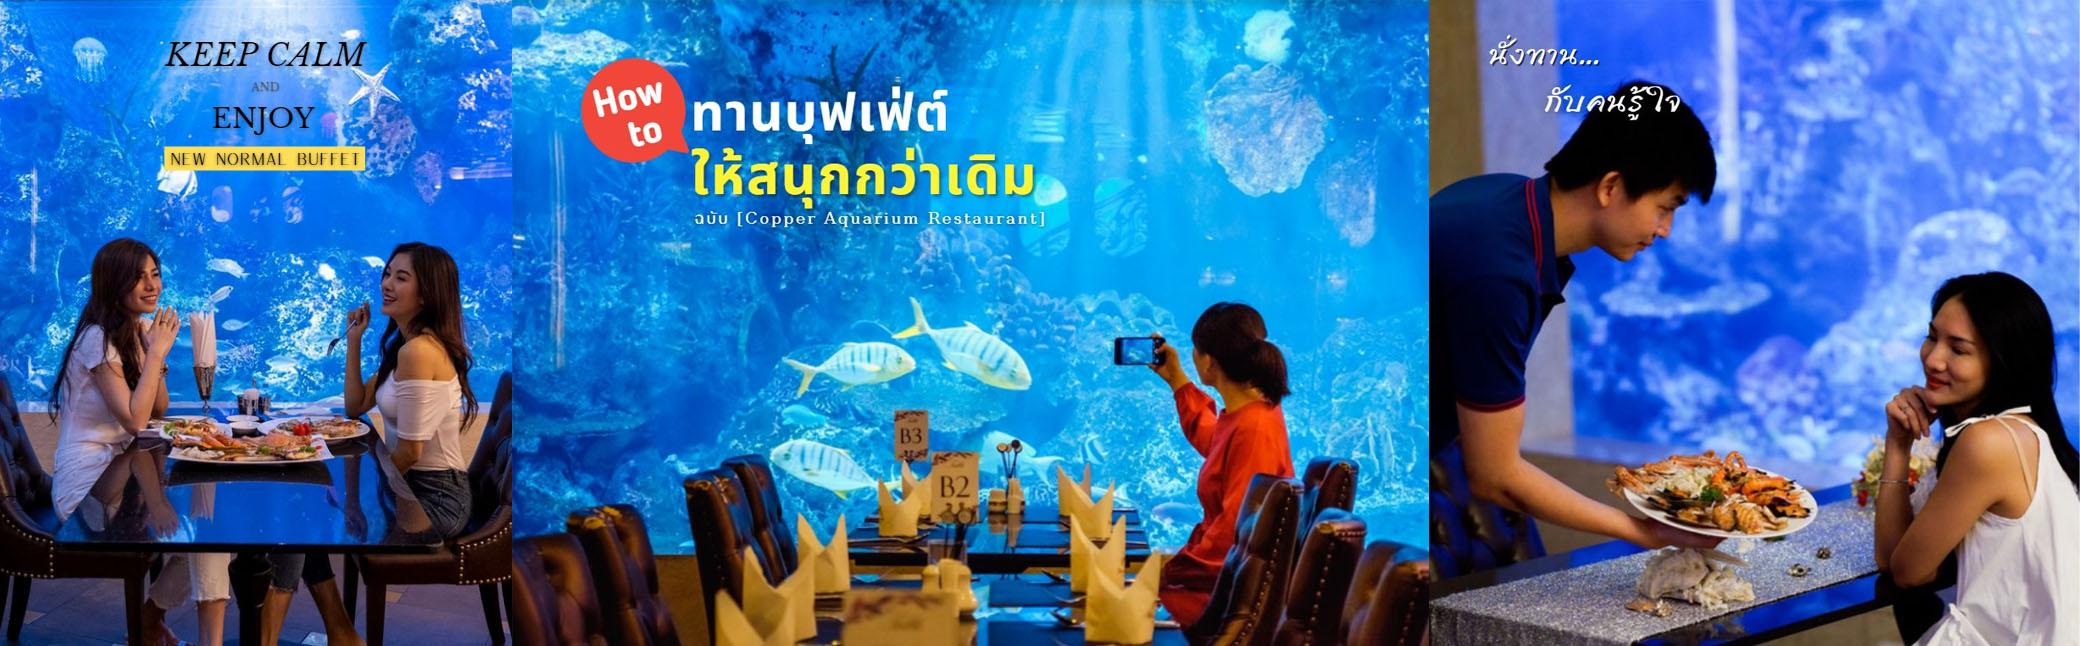 Copper Aquarium Restaurant โปรบุฟเฟ่ต์ Seafood พรีเมี่ยม++ เพียง 850฿